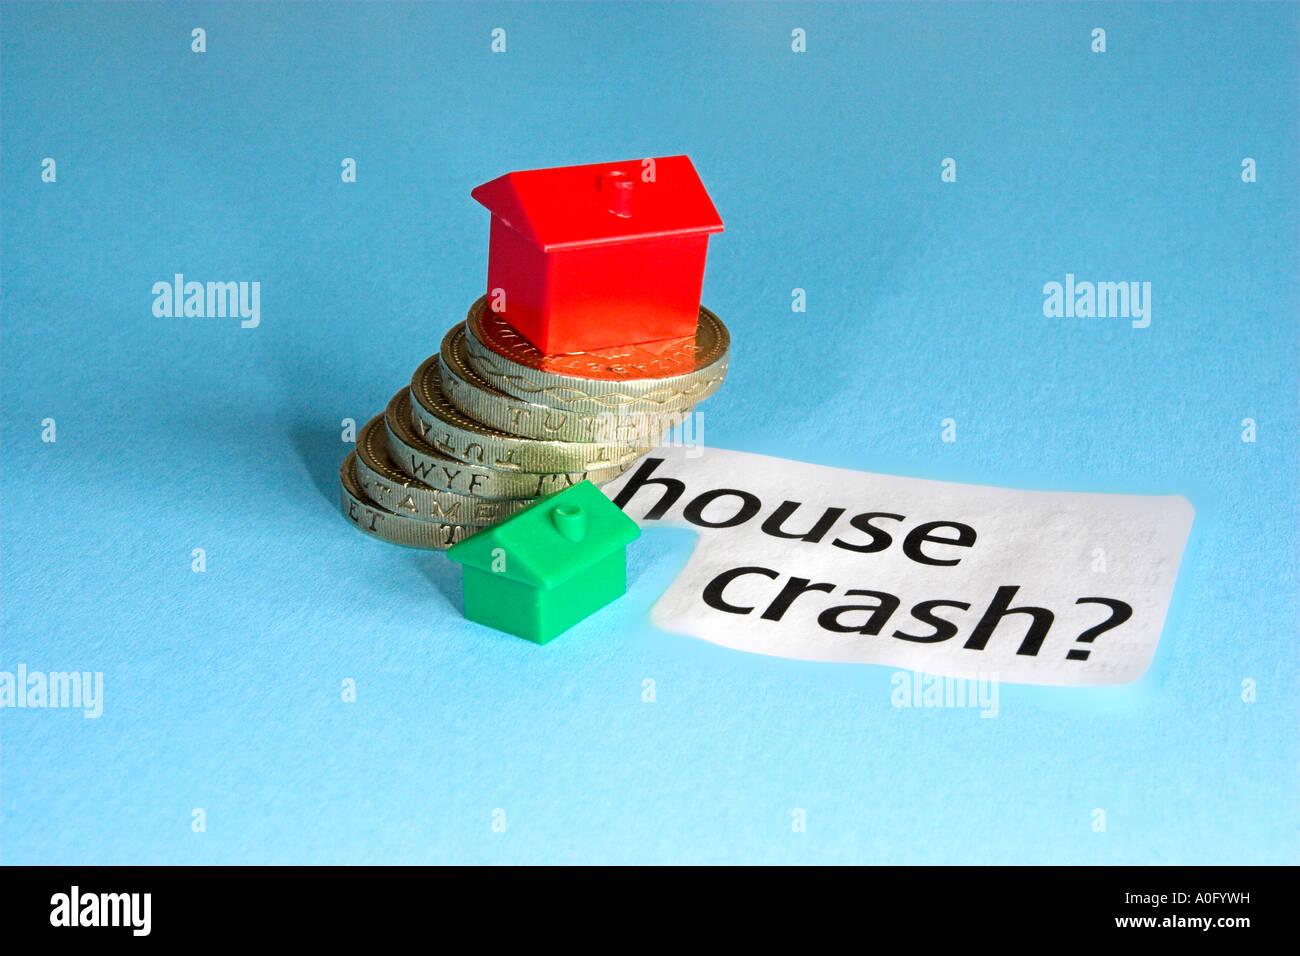 house price crash stock photo, royalty free image: 9984988 - alamy